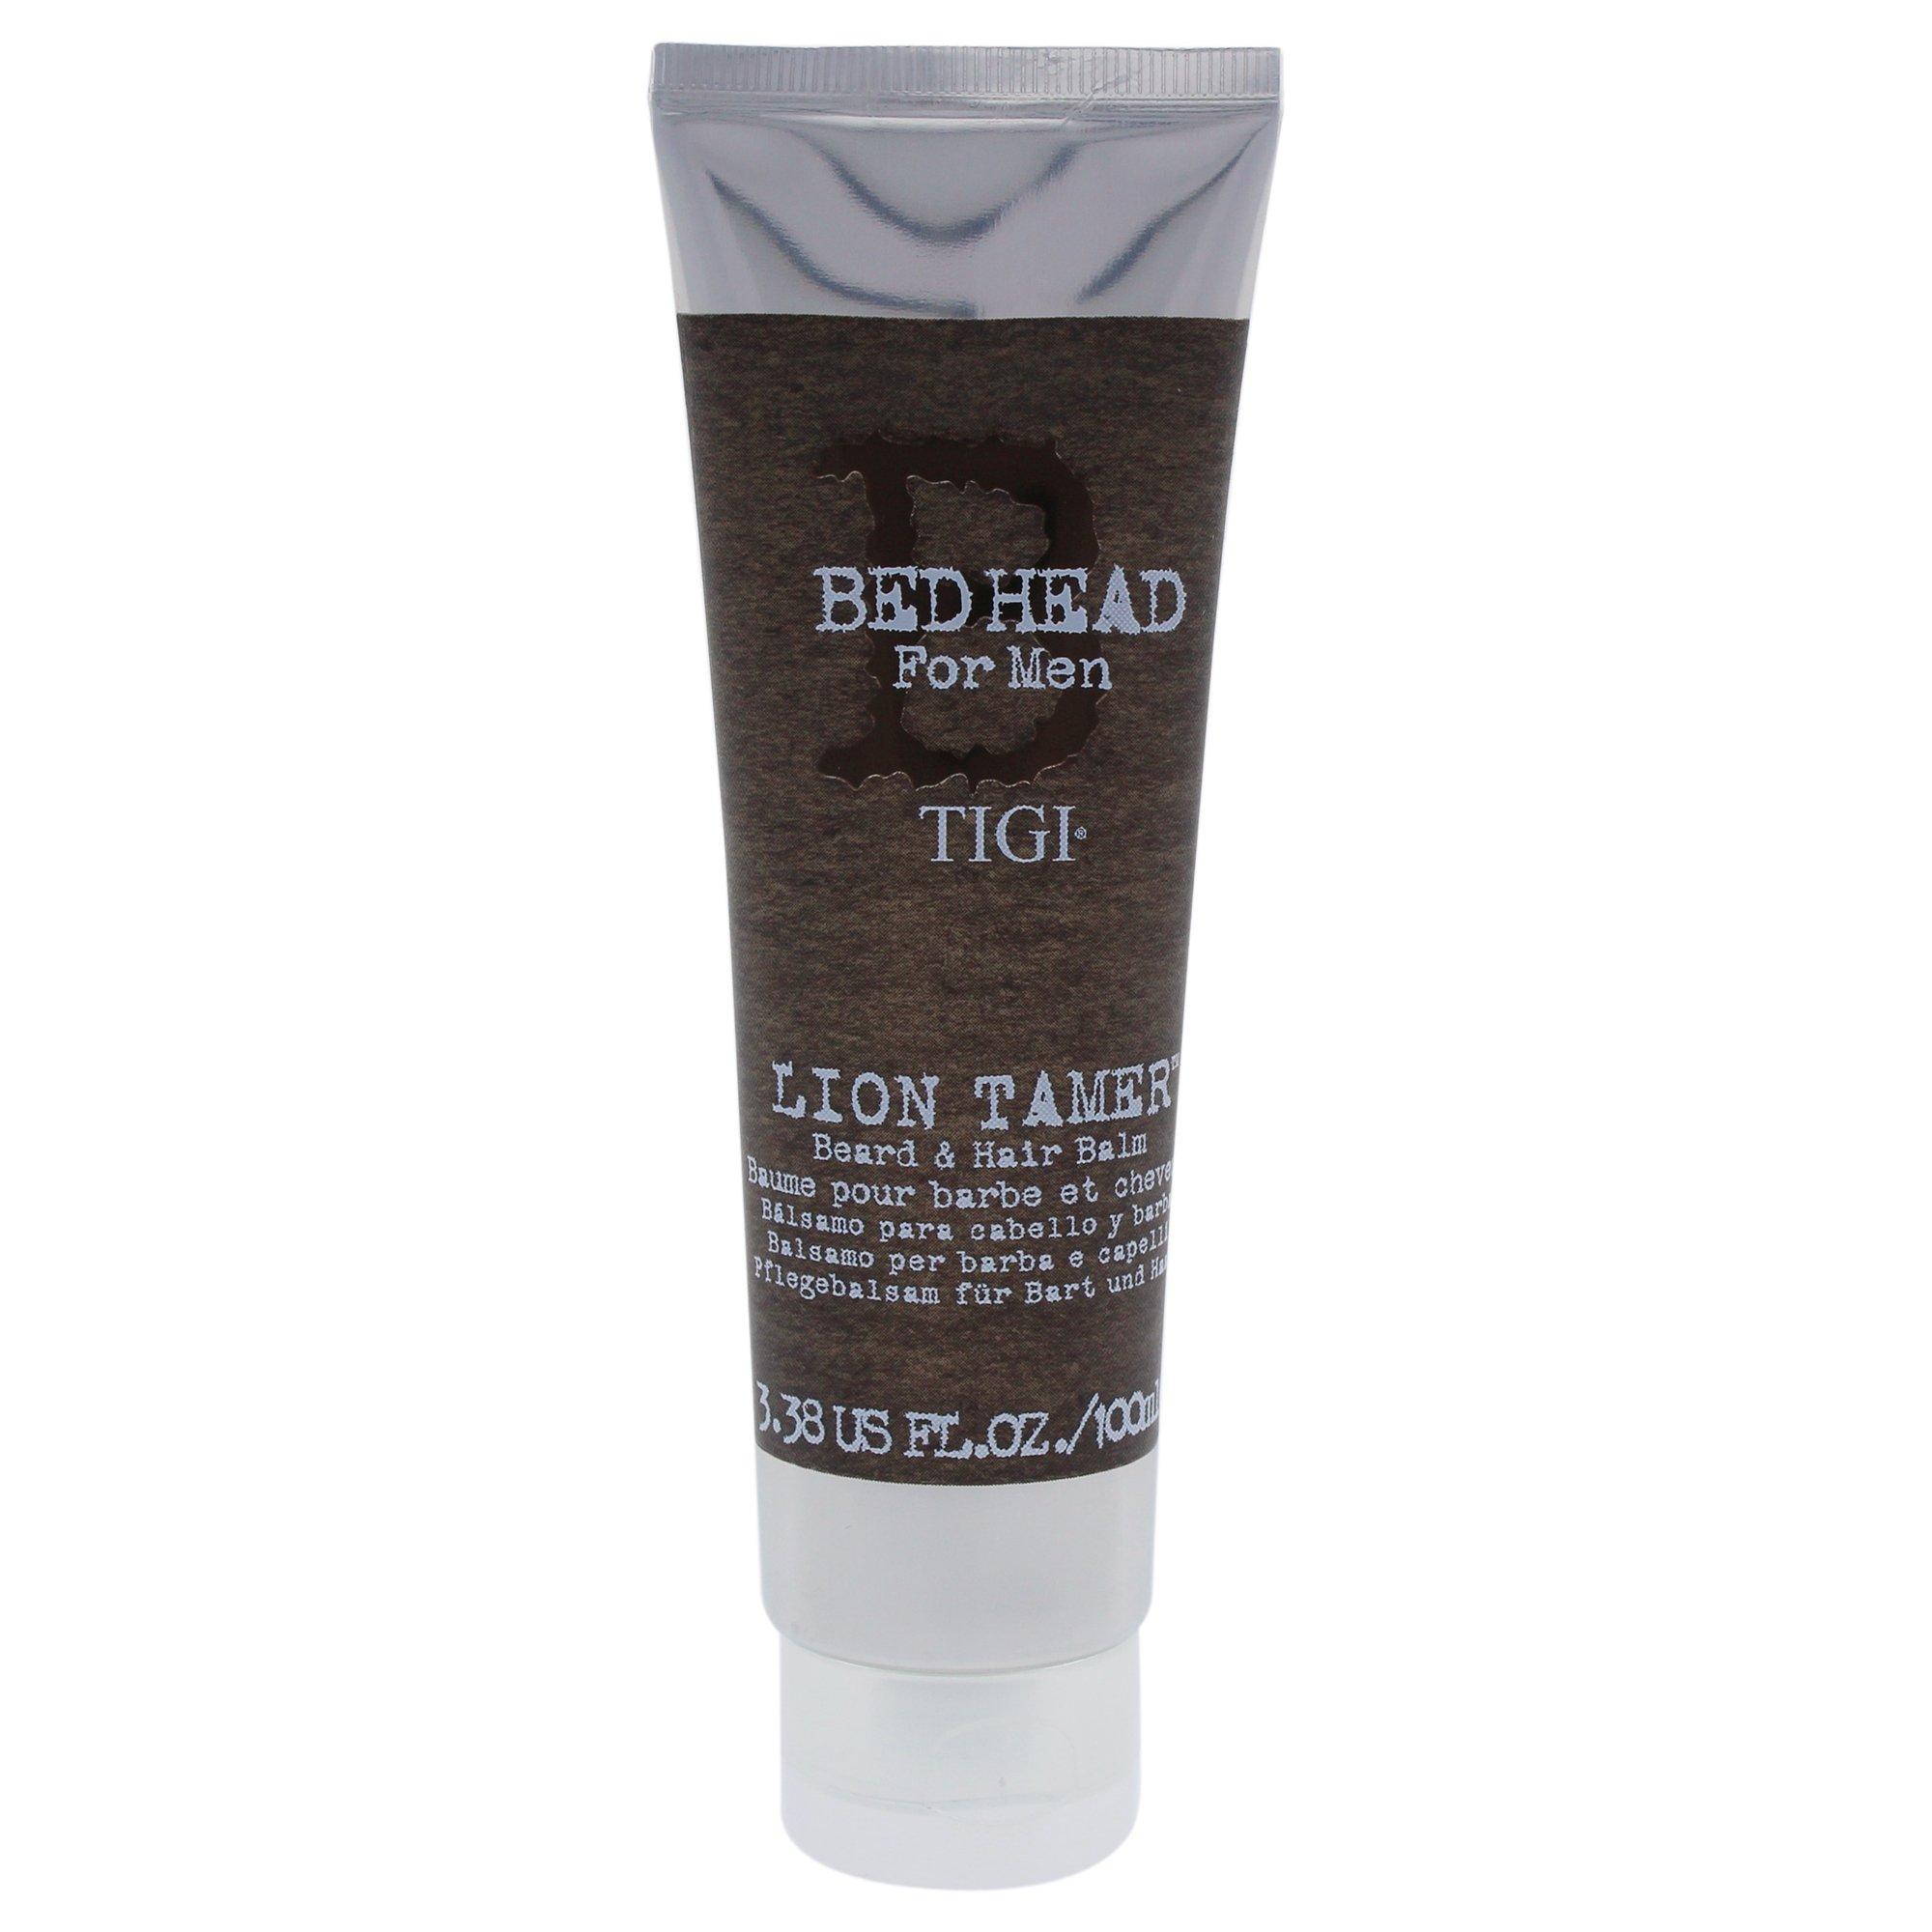 Amazon.com : Bed Head for Men Fuel Around Beard Oil, 1.7